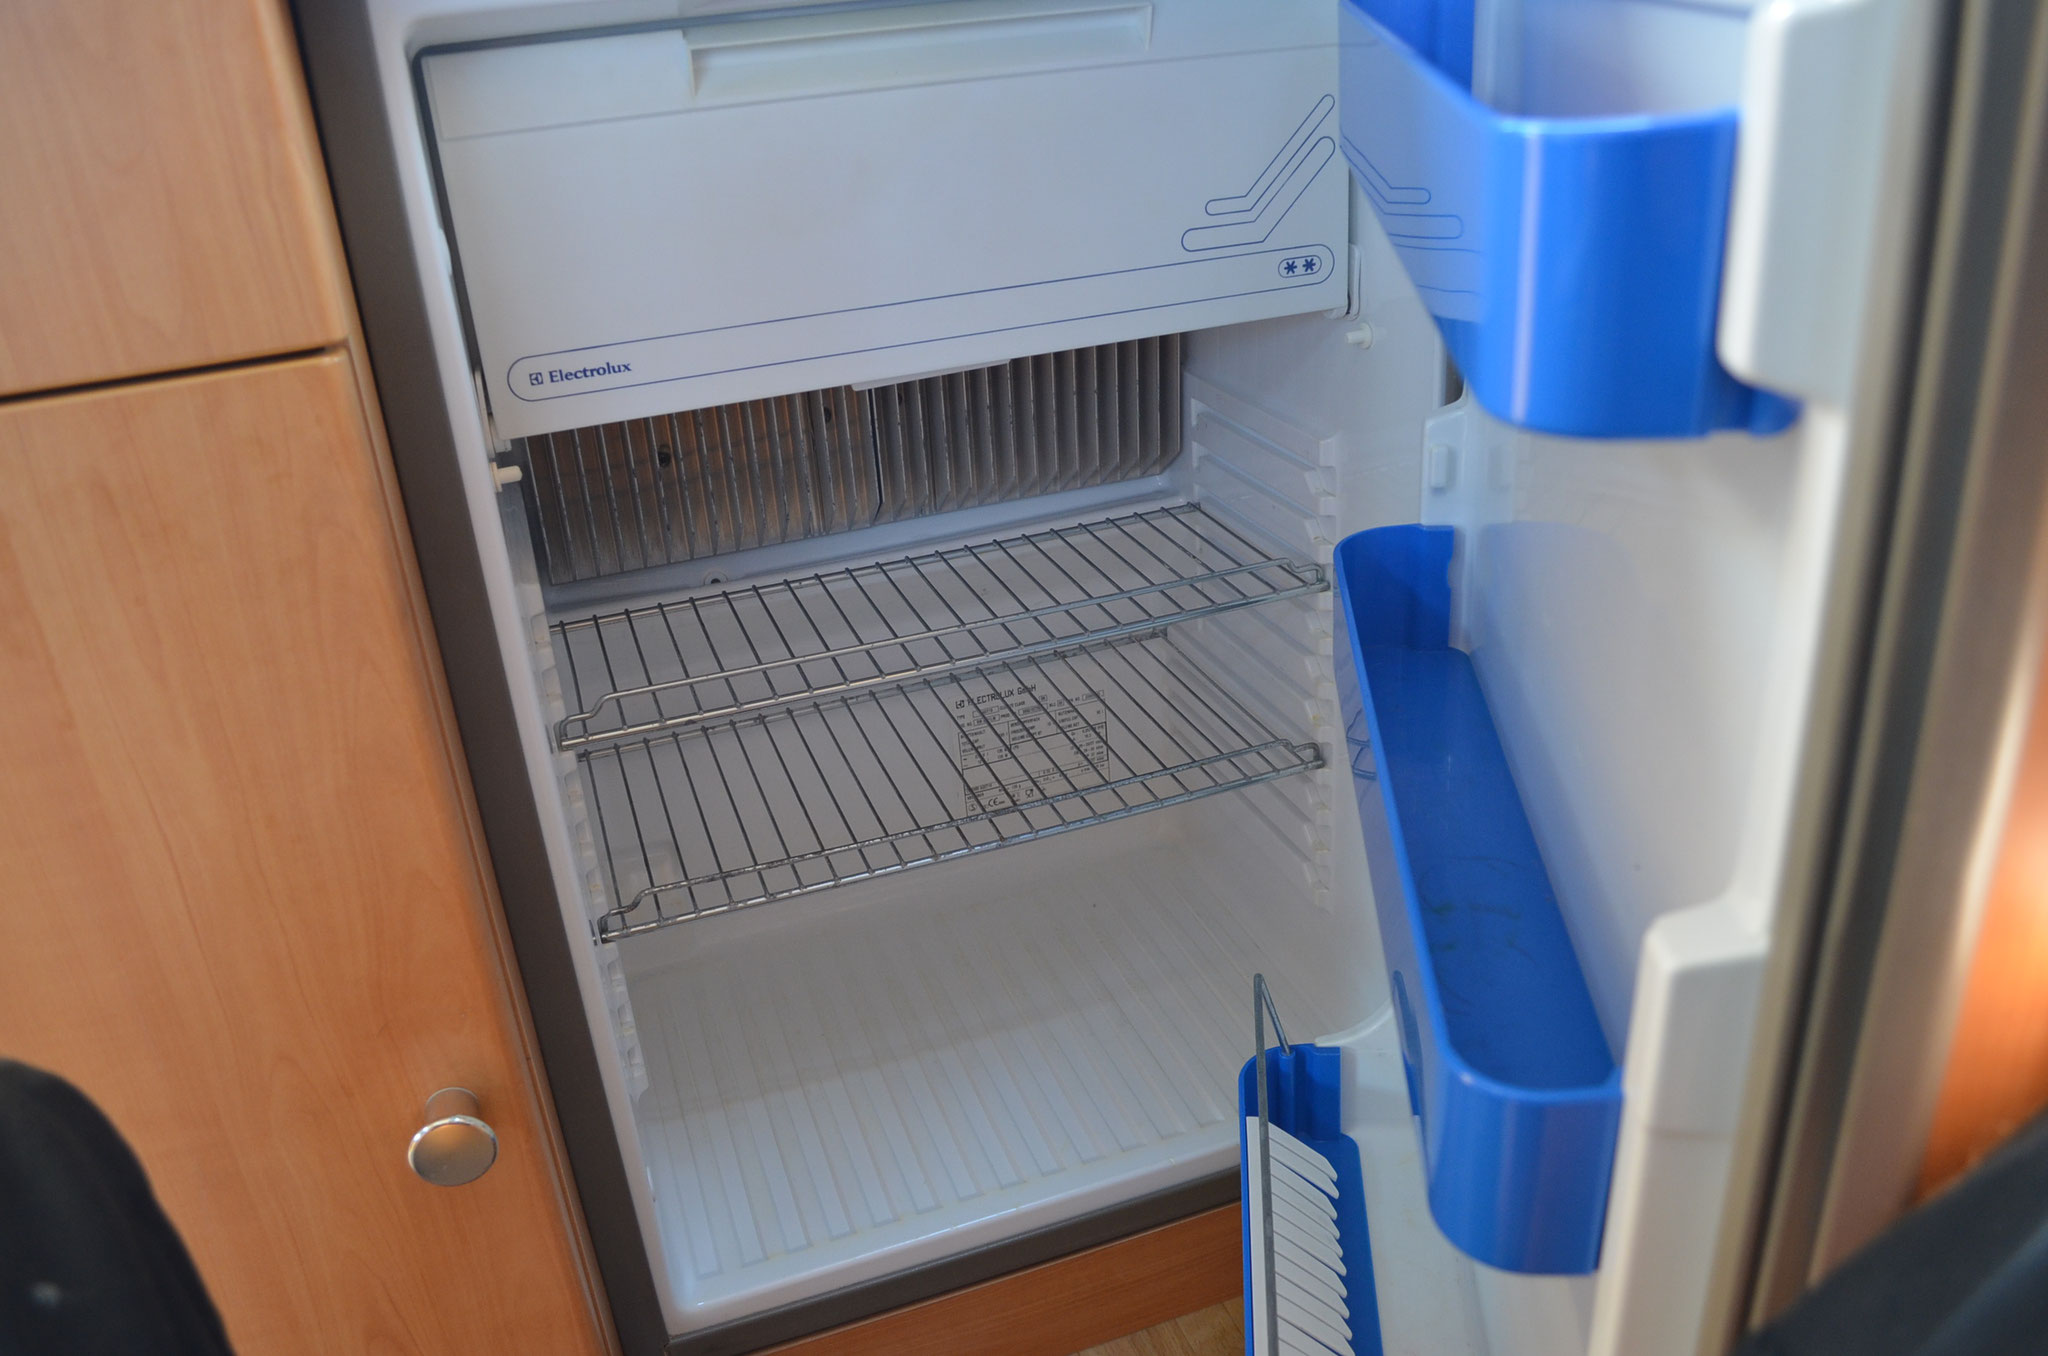 Kühlschrank ( Gasbetrieb, Elektrobetrieb, Batteriebetrieb)